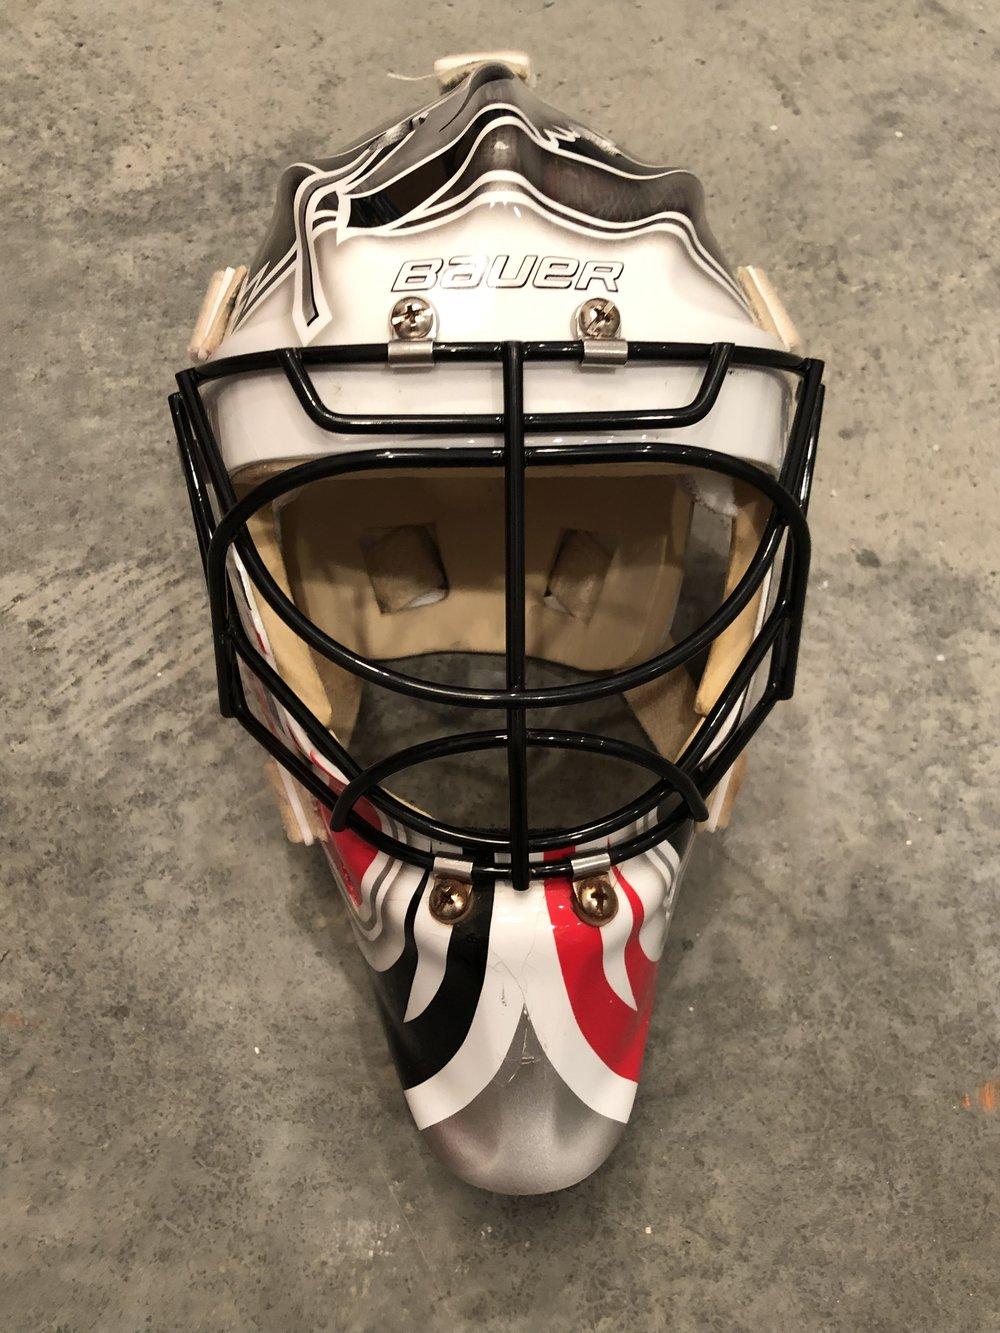 2011-12 Brian Boucher Carolina Hurricanes fame worn mask